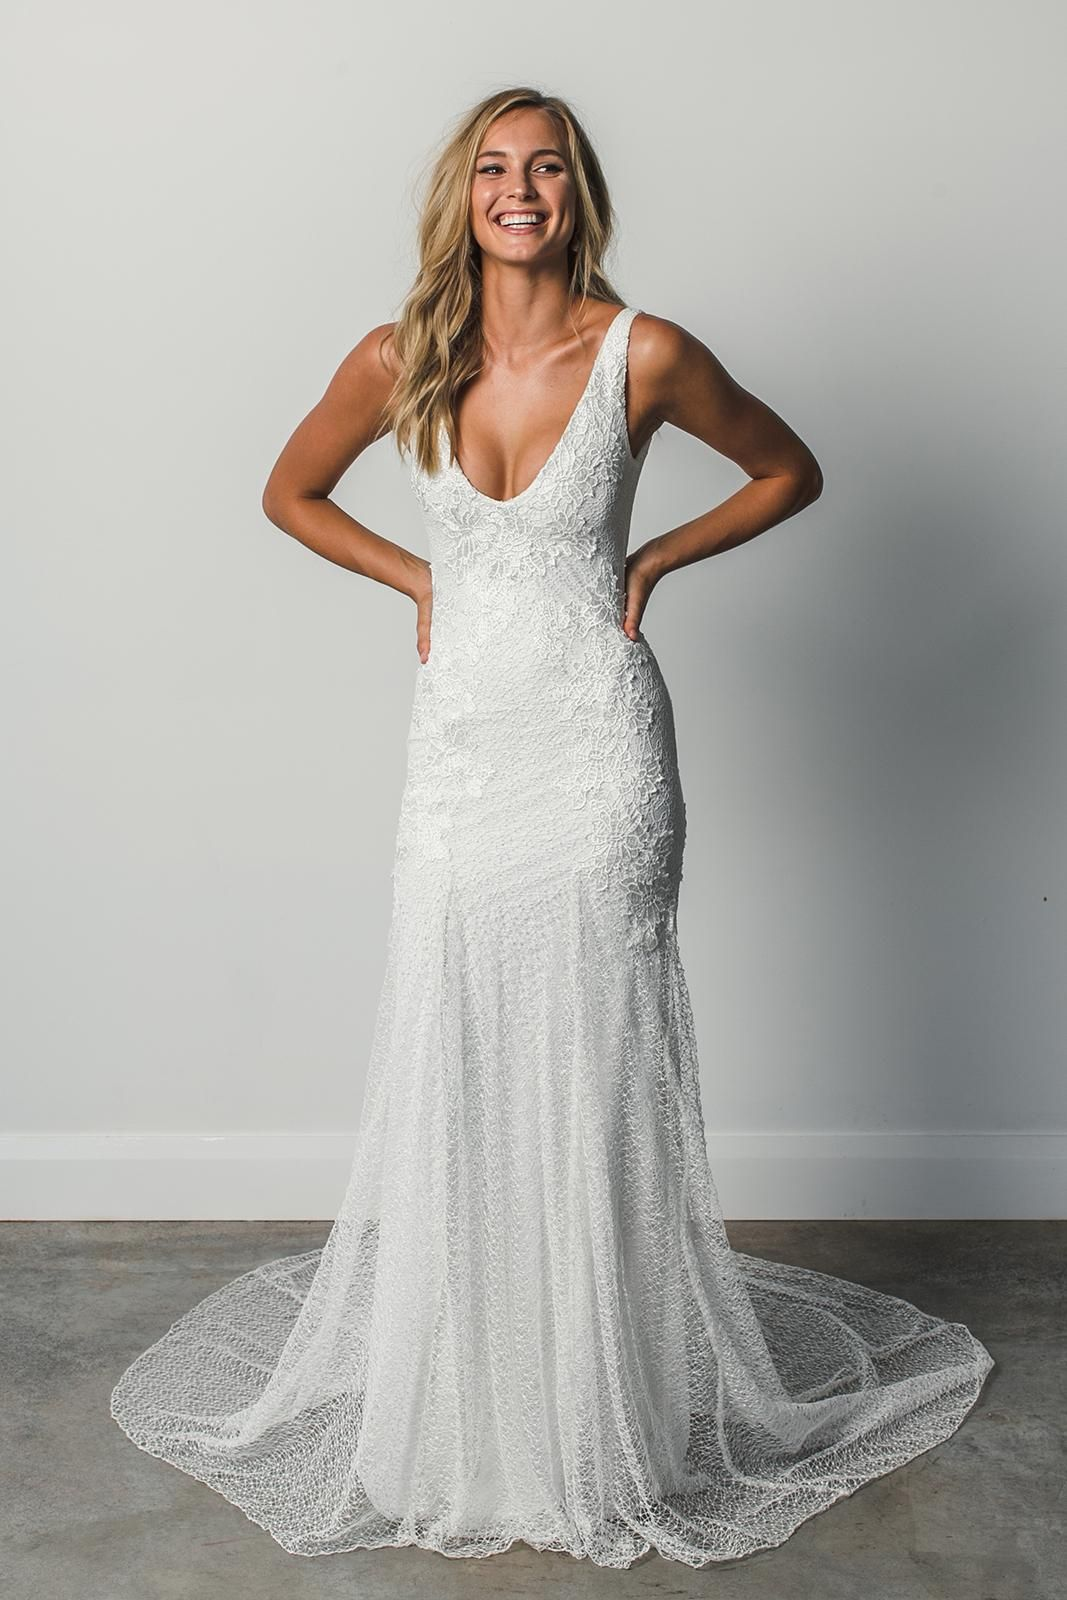 Pin by abby prestrud on wedding dresses pinterest wedding